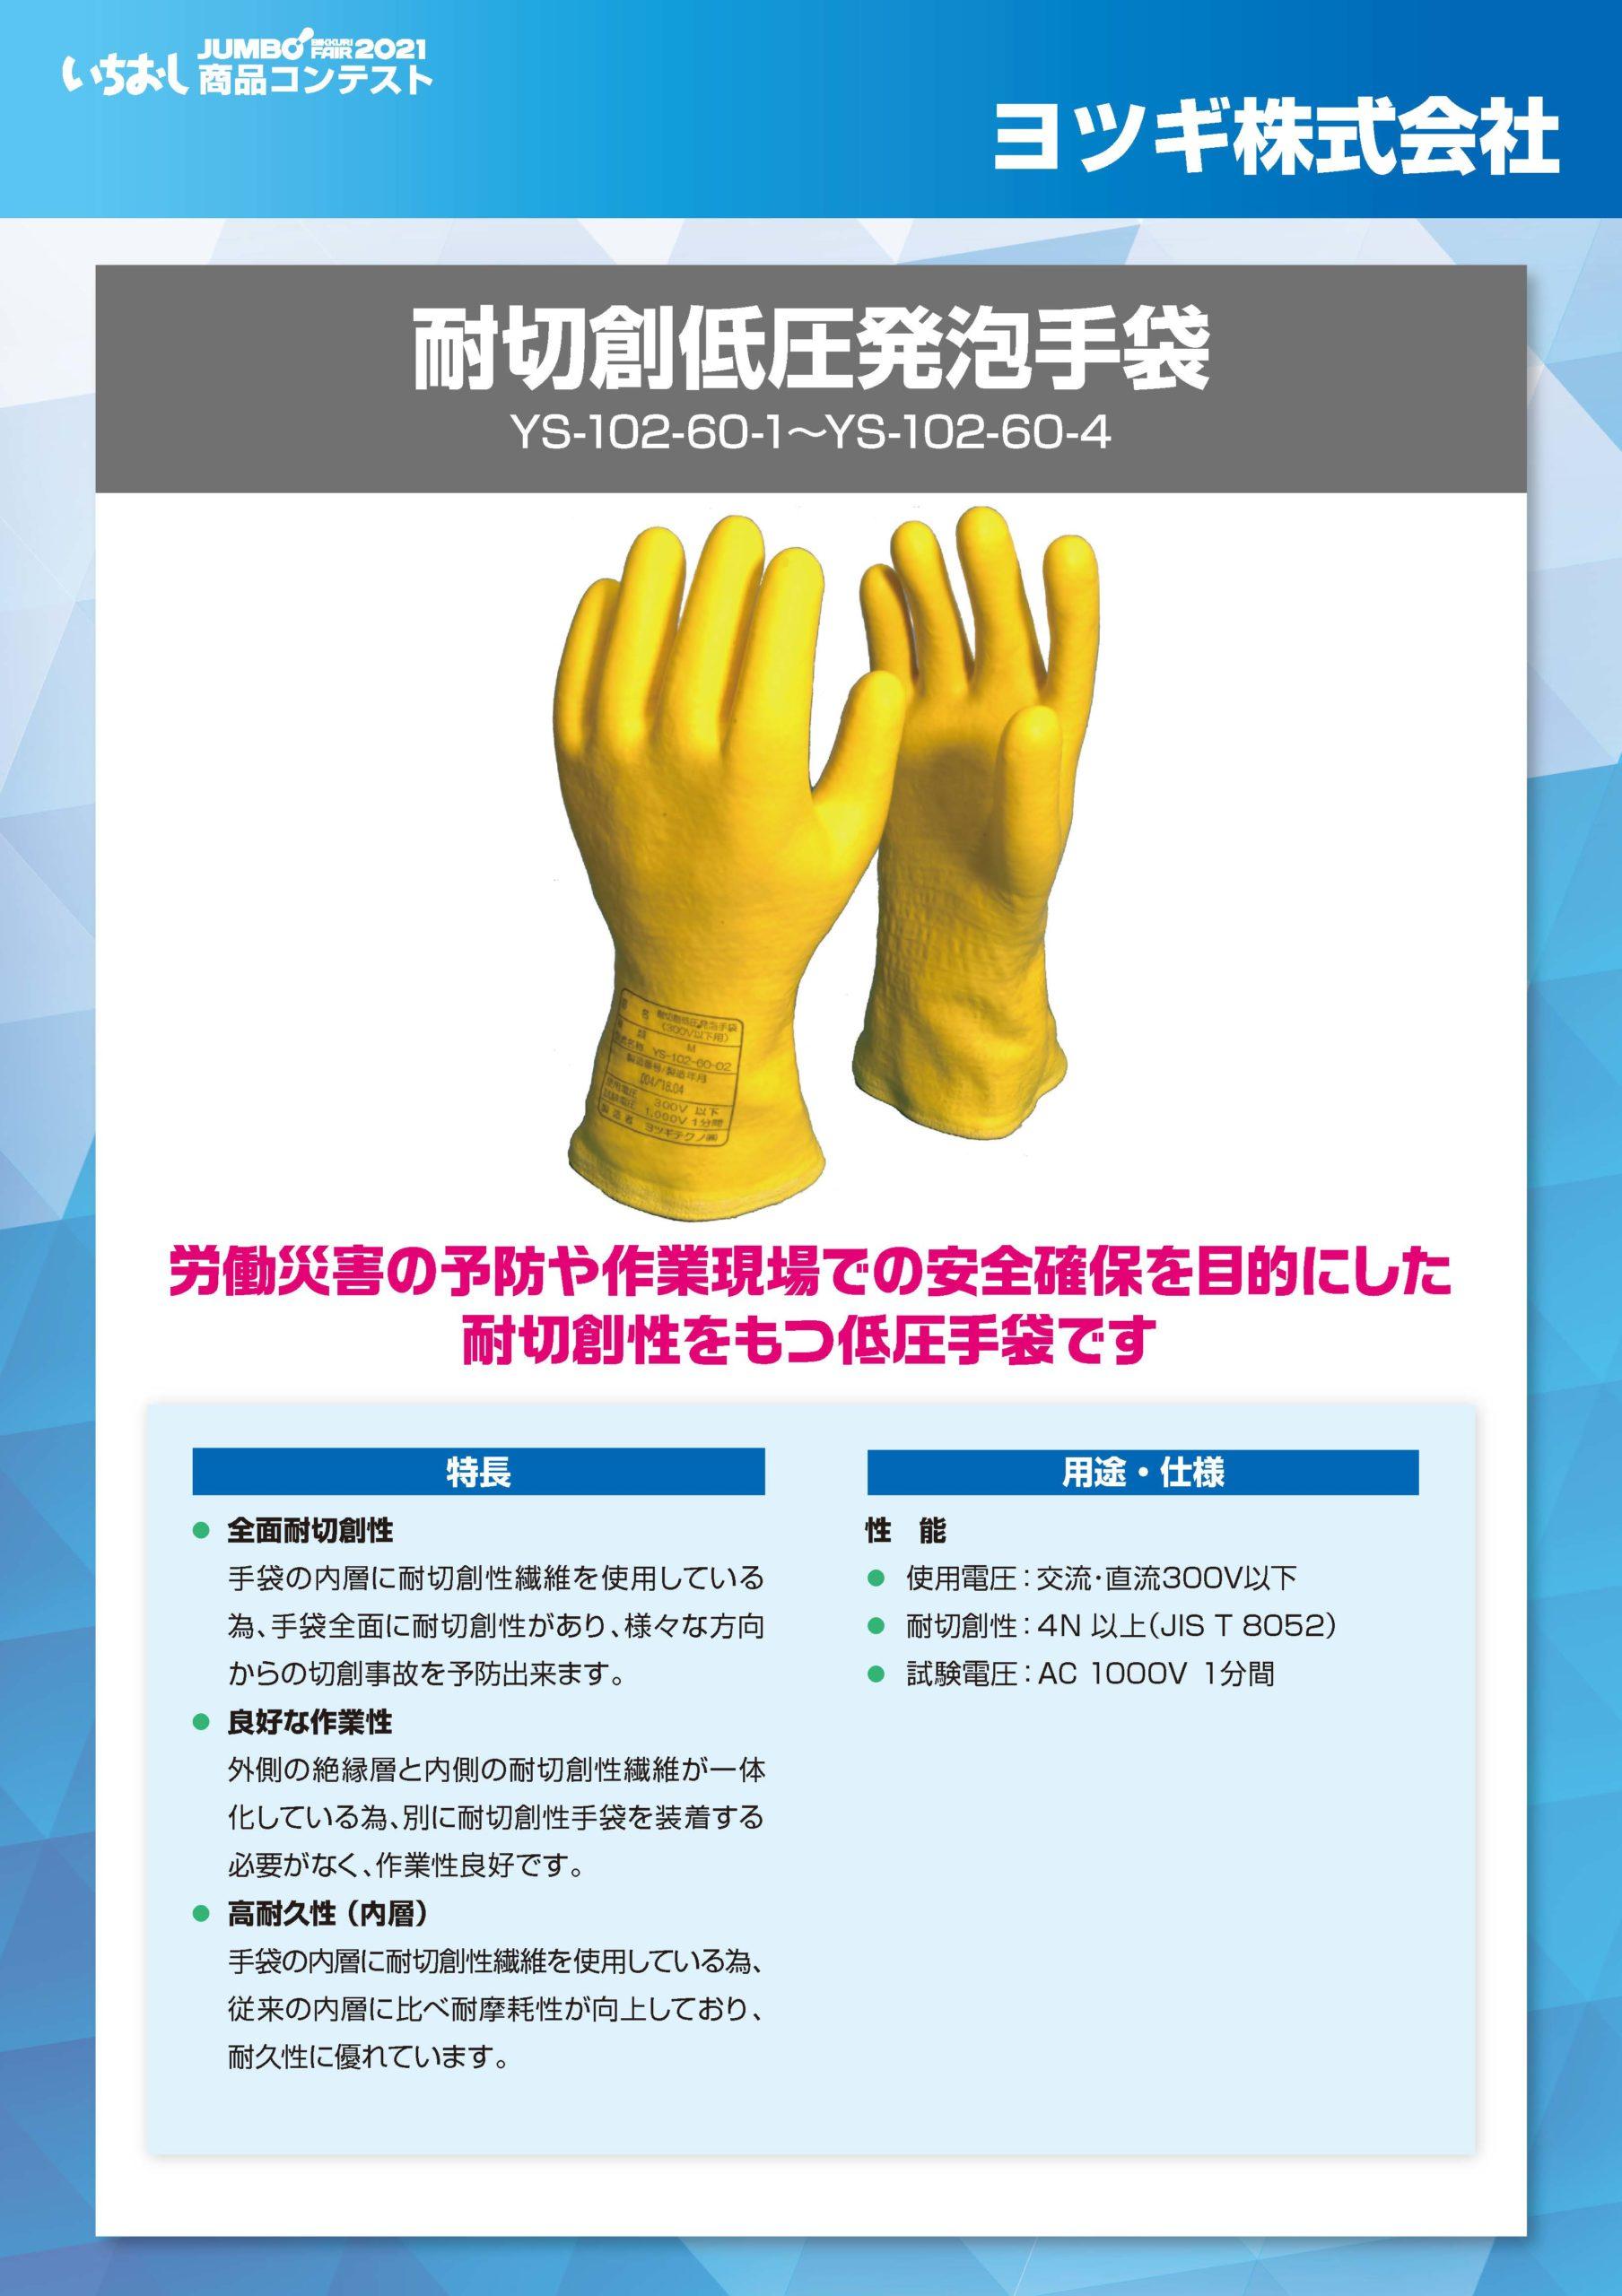 「耐切創低圧発泡手袋」ヨツギ株式会社の画像